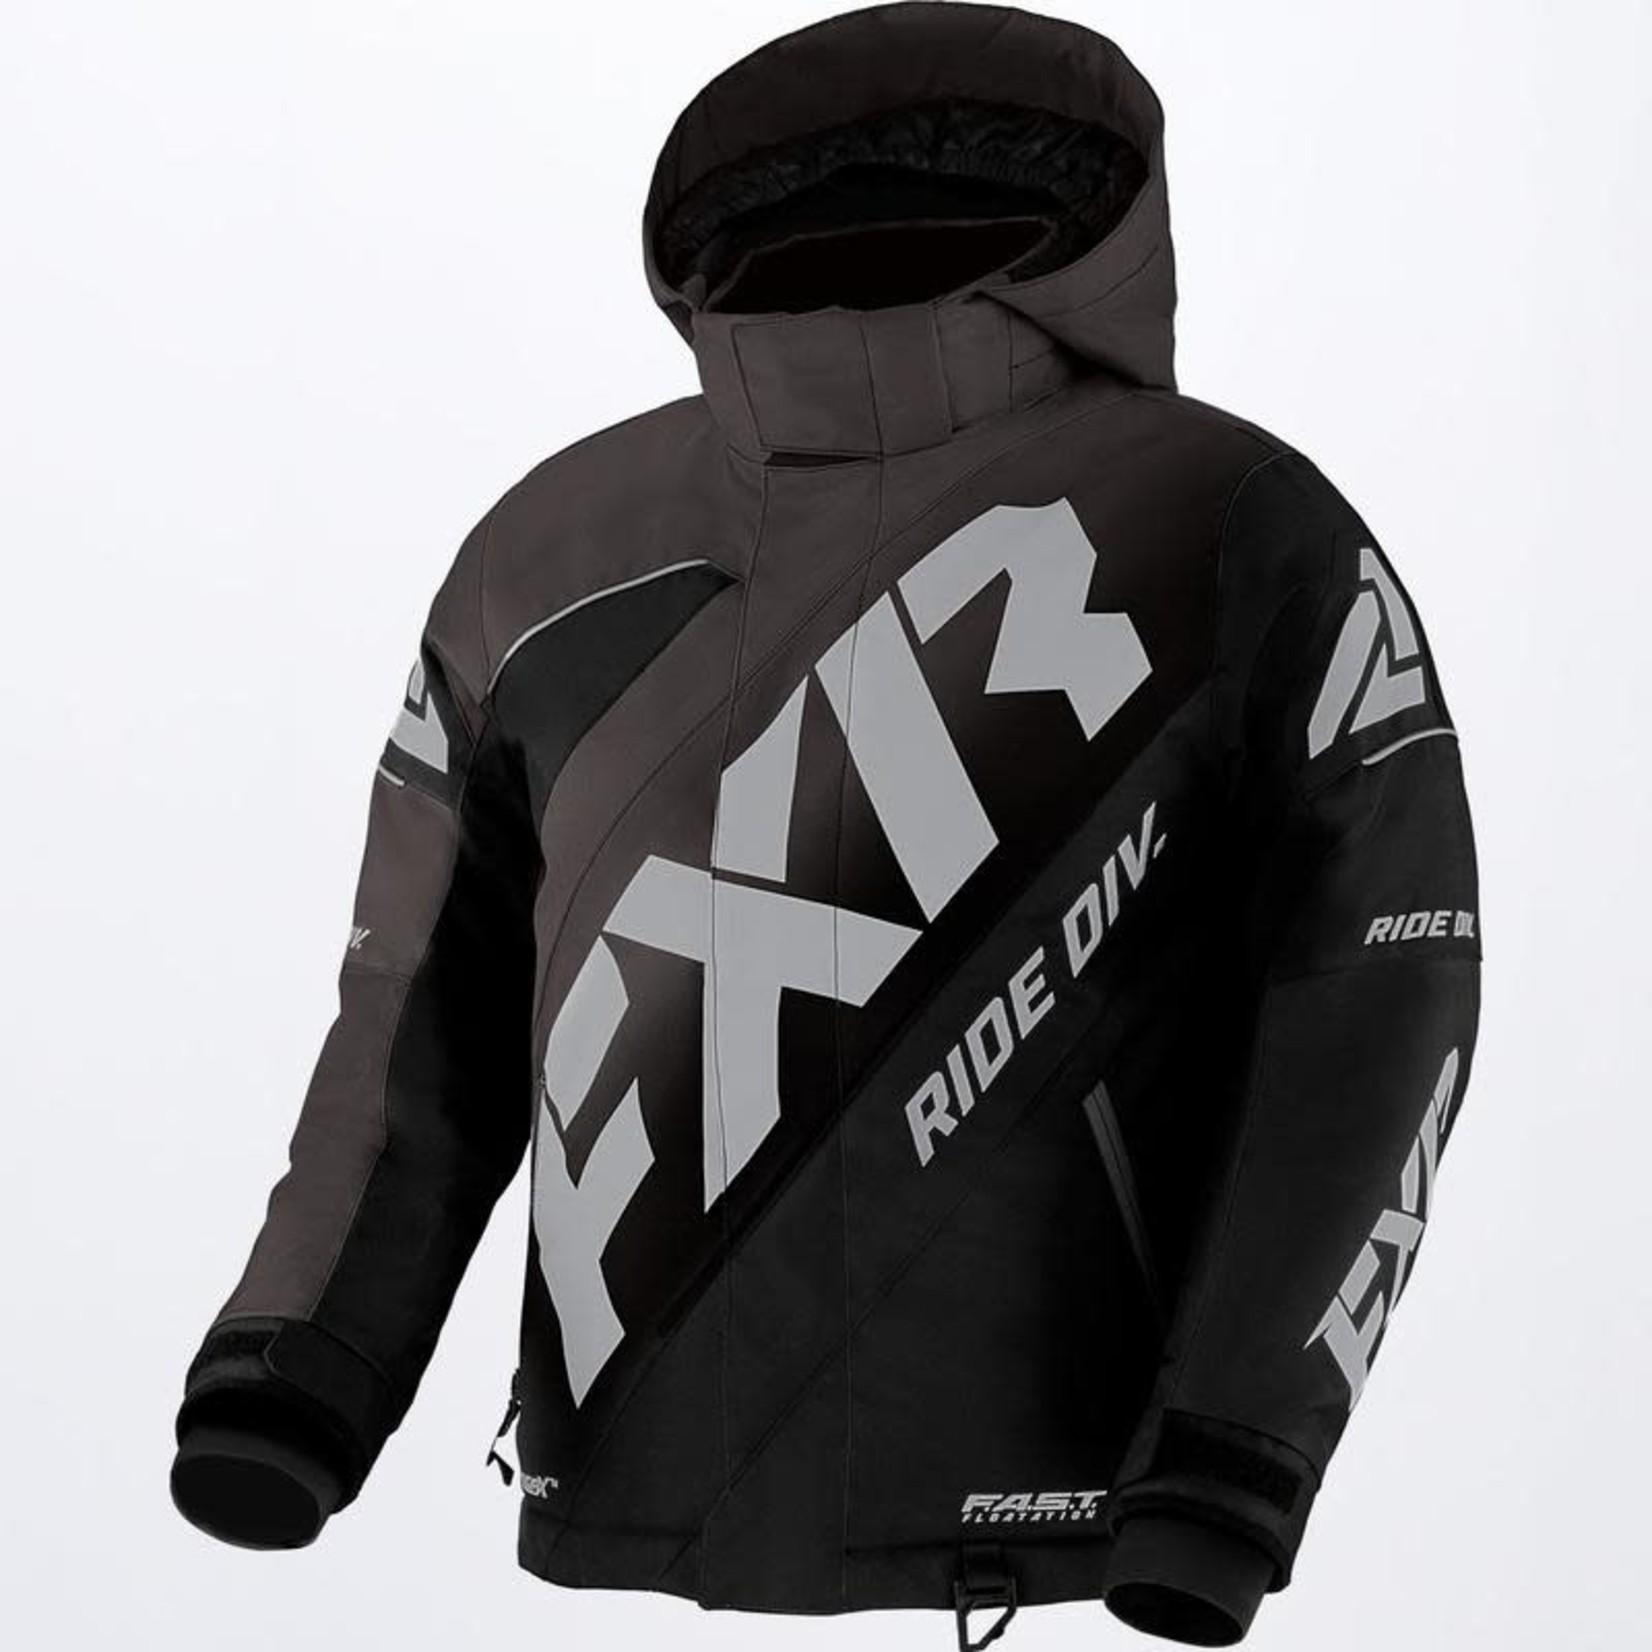 FXR FXR Winter Jacket, CX, Youth, Boys